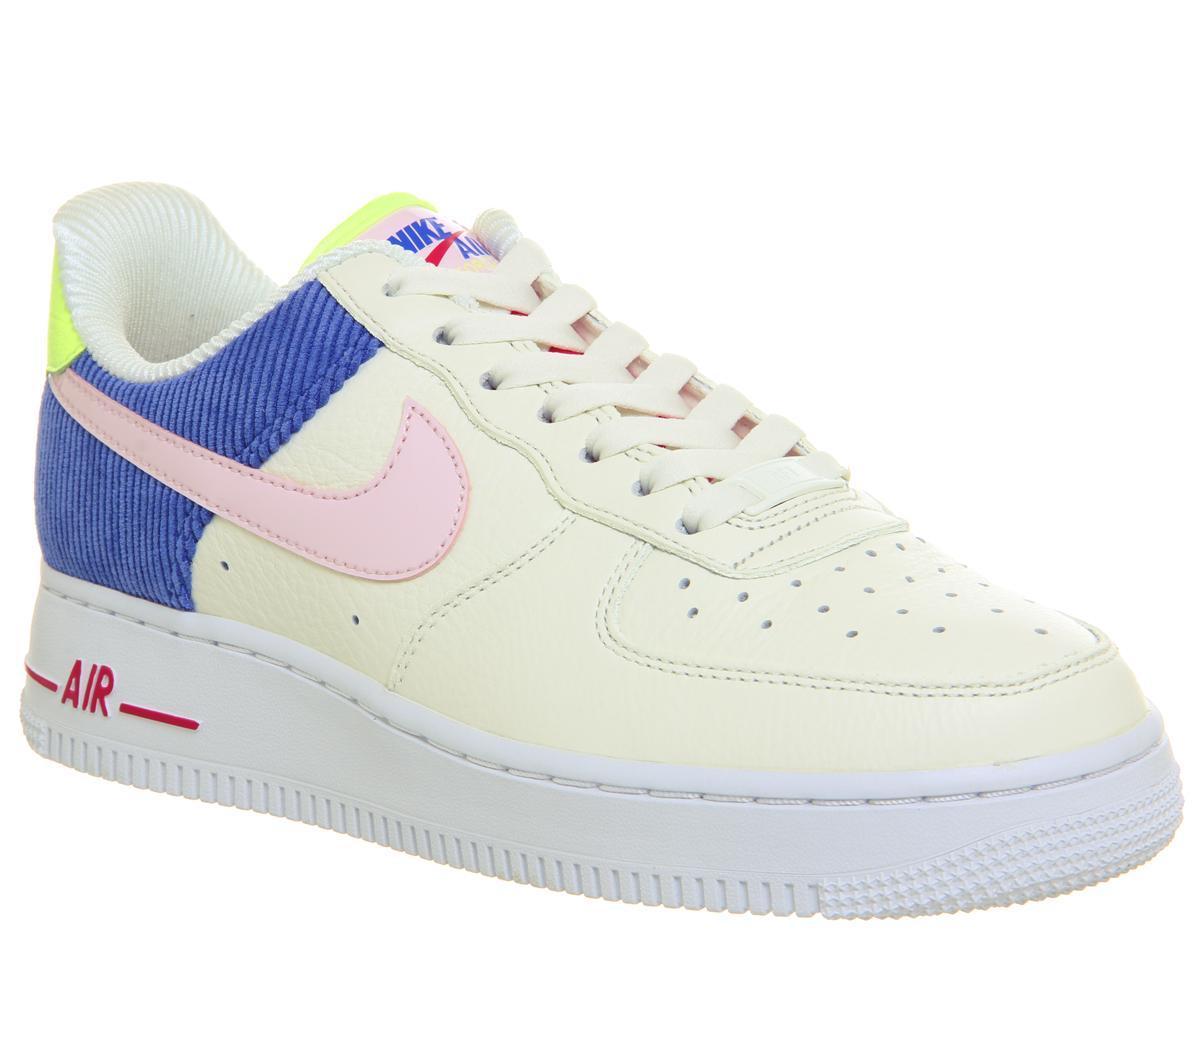 Nike Air Force 1 07 Artic Pink Racer